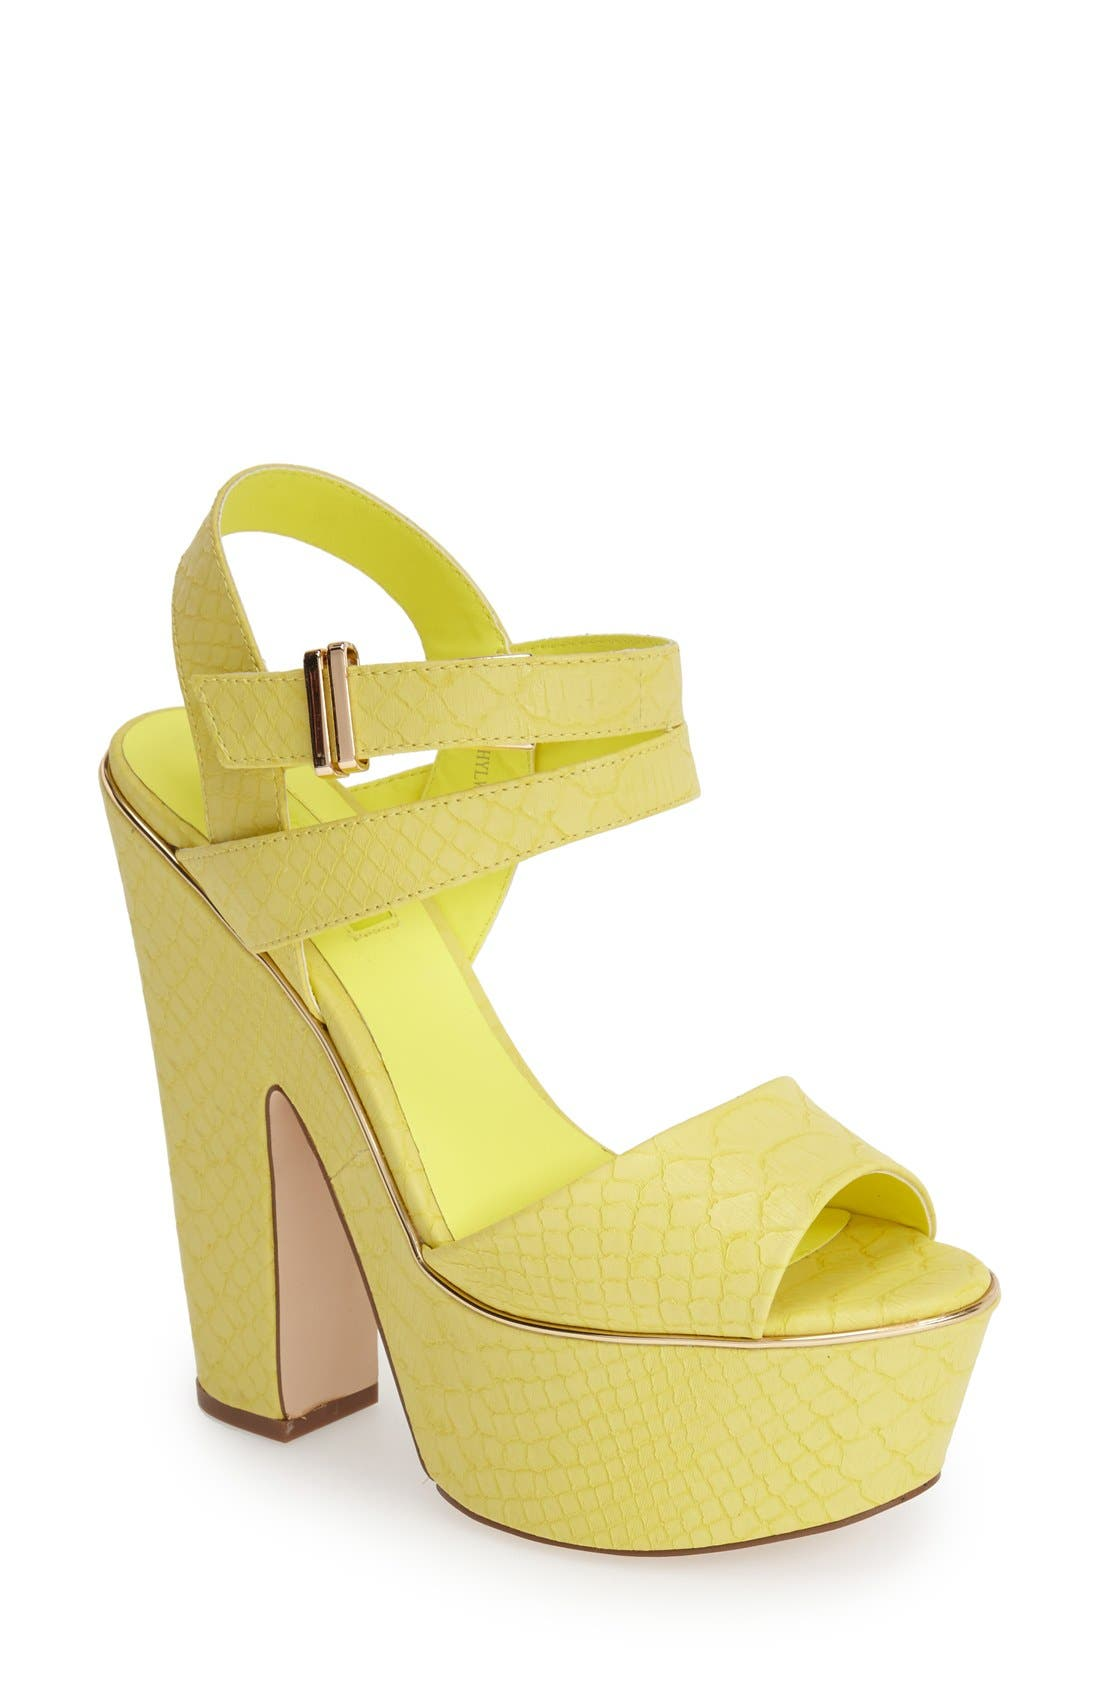 Main Image - Topshop 'Lenni2' Platform Sandal (Women)